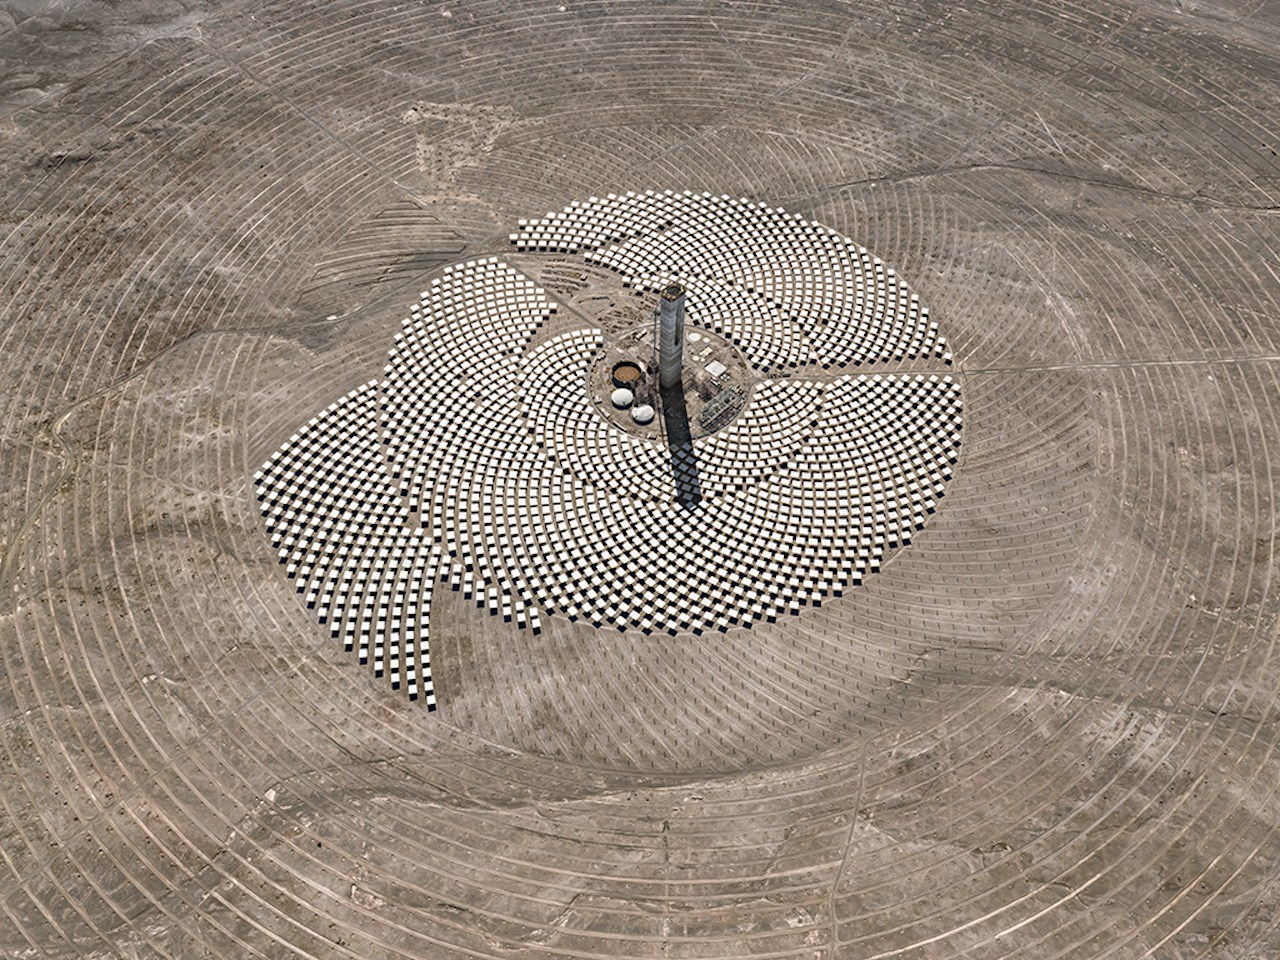 Cerro Dominador Solar Project #1, Atacama Desert, Chil, 2017 / Photo: © Edward Burtynsky, courtesy of Flowers Gallery, London/ Nicholas Metivier Gallery, Toronto.